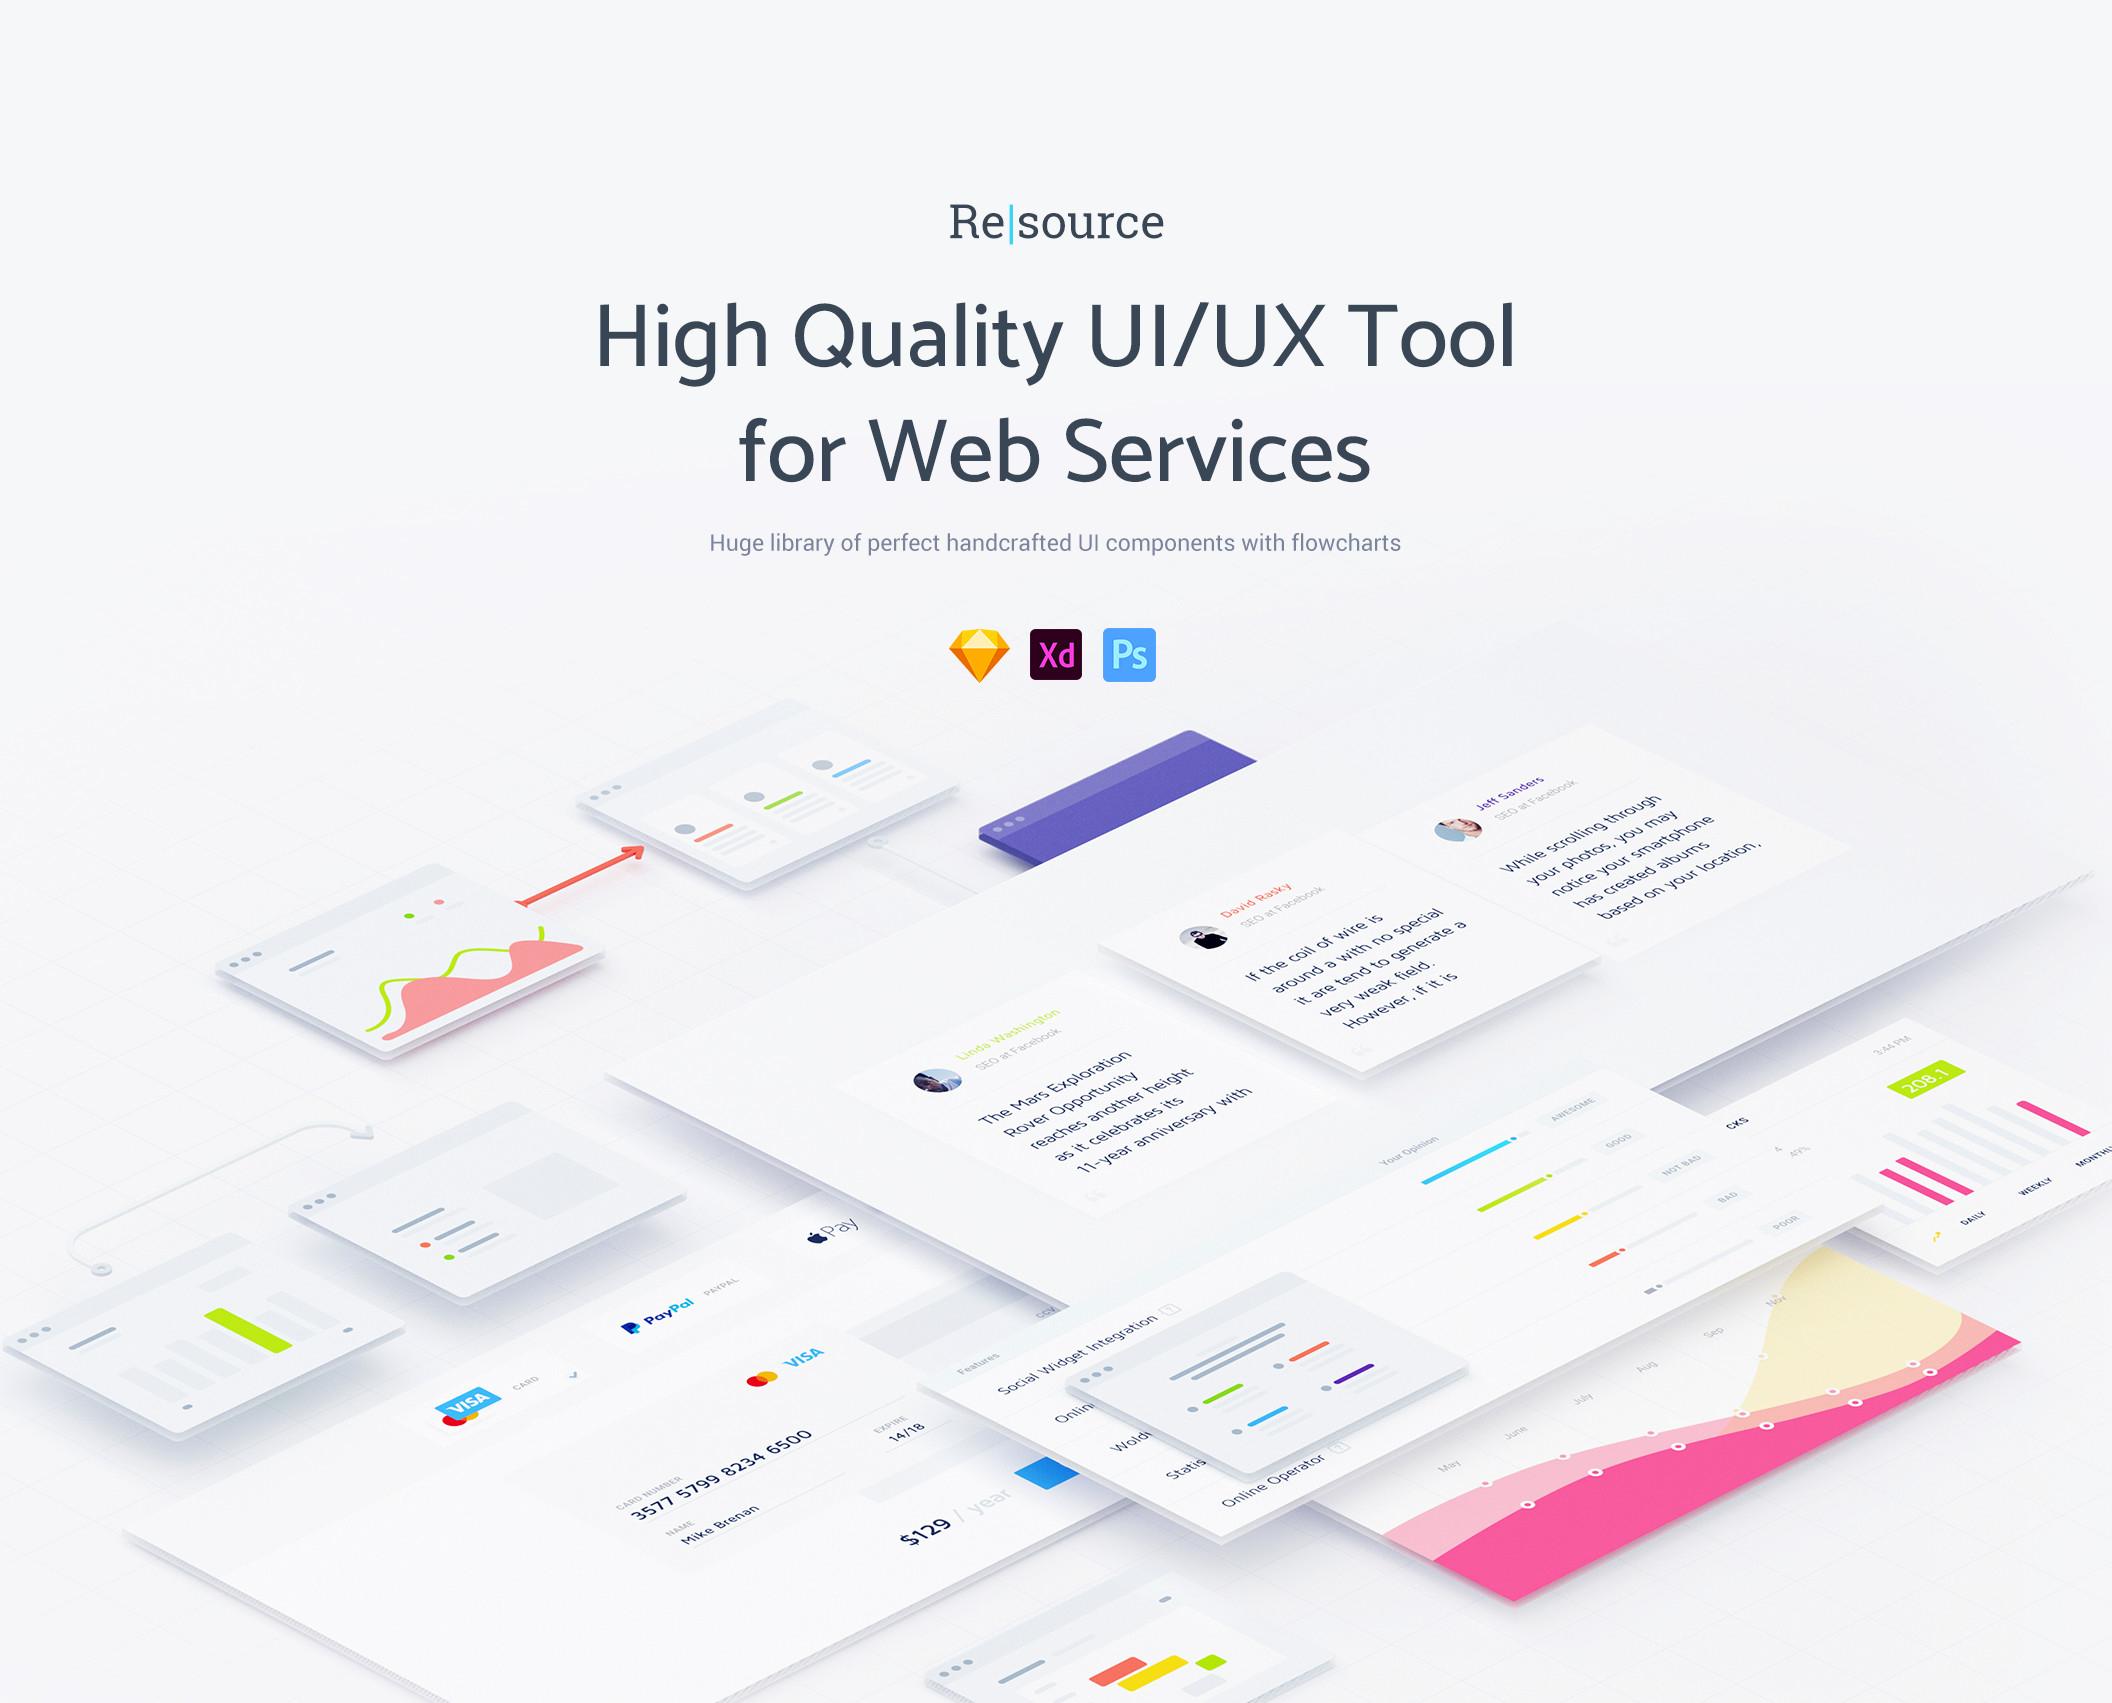 [VIP专享]绝对精品高质量的UI / UX设计工具包黑白两种风格.Sketch&Photoshop&XD素材下载 VIP主题包-第1张